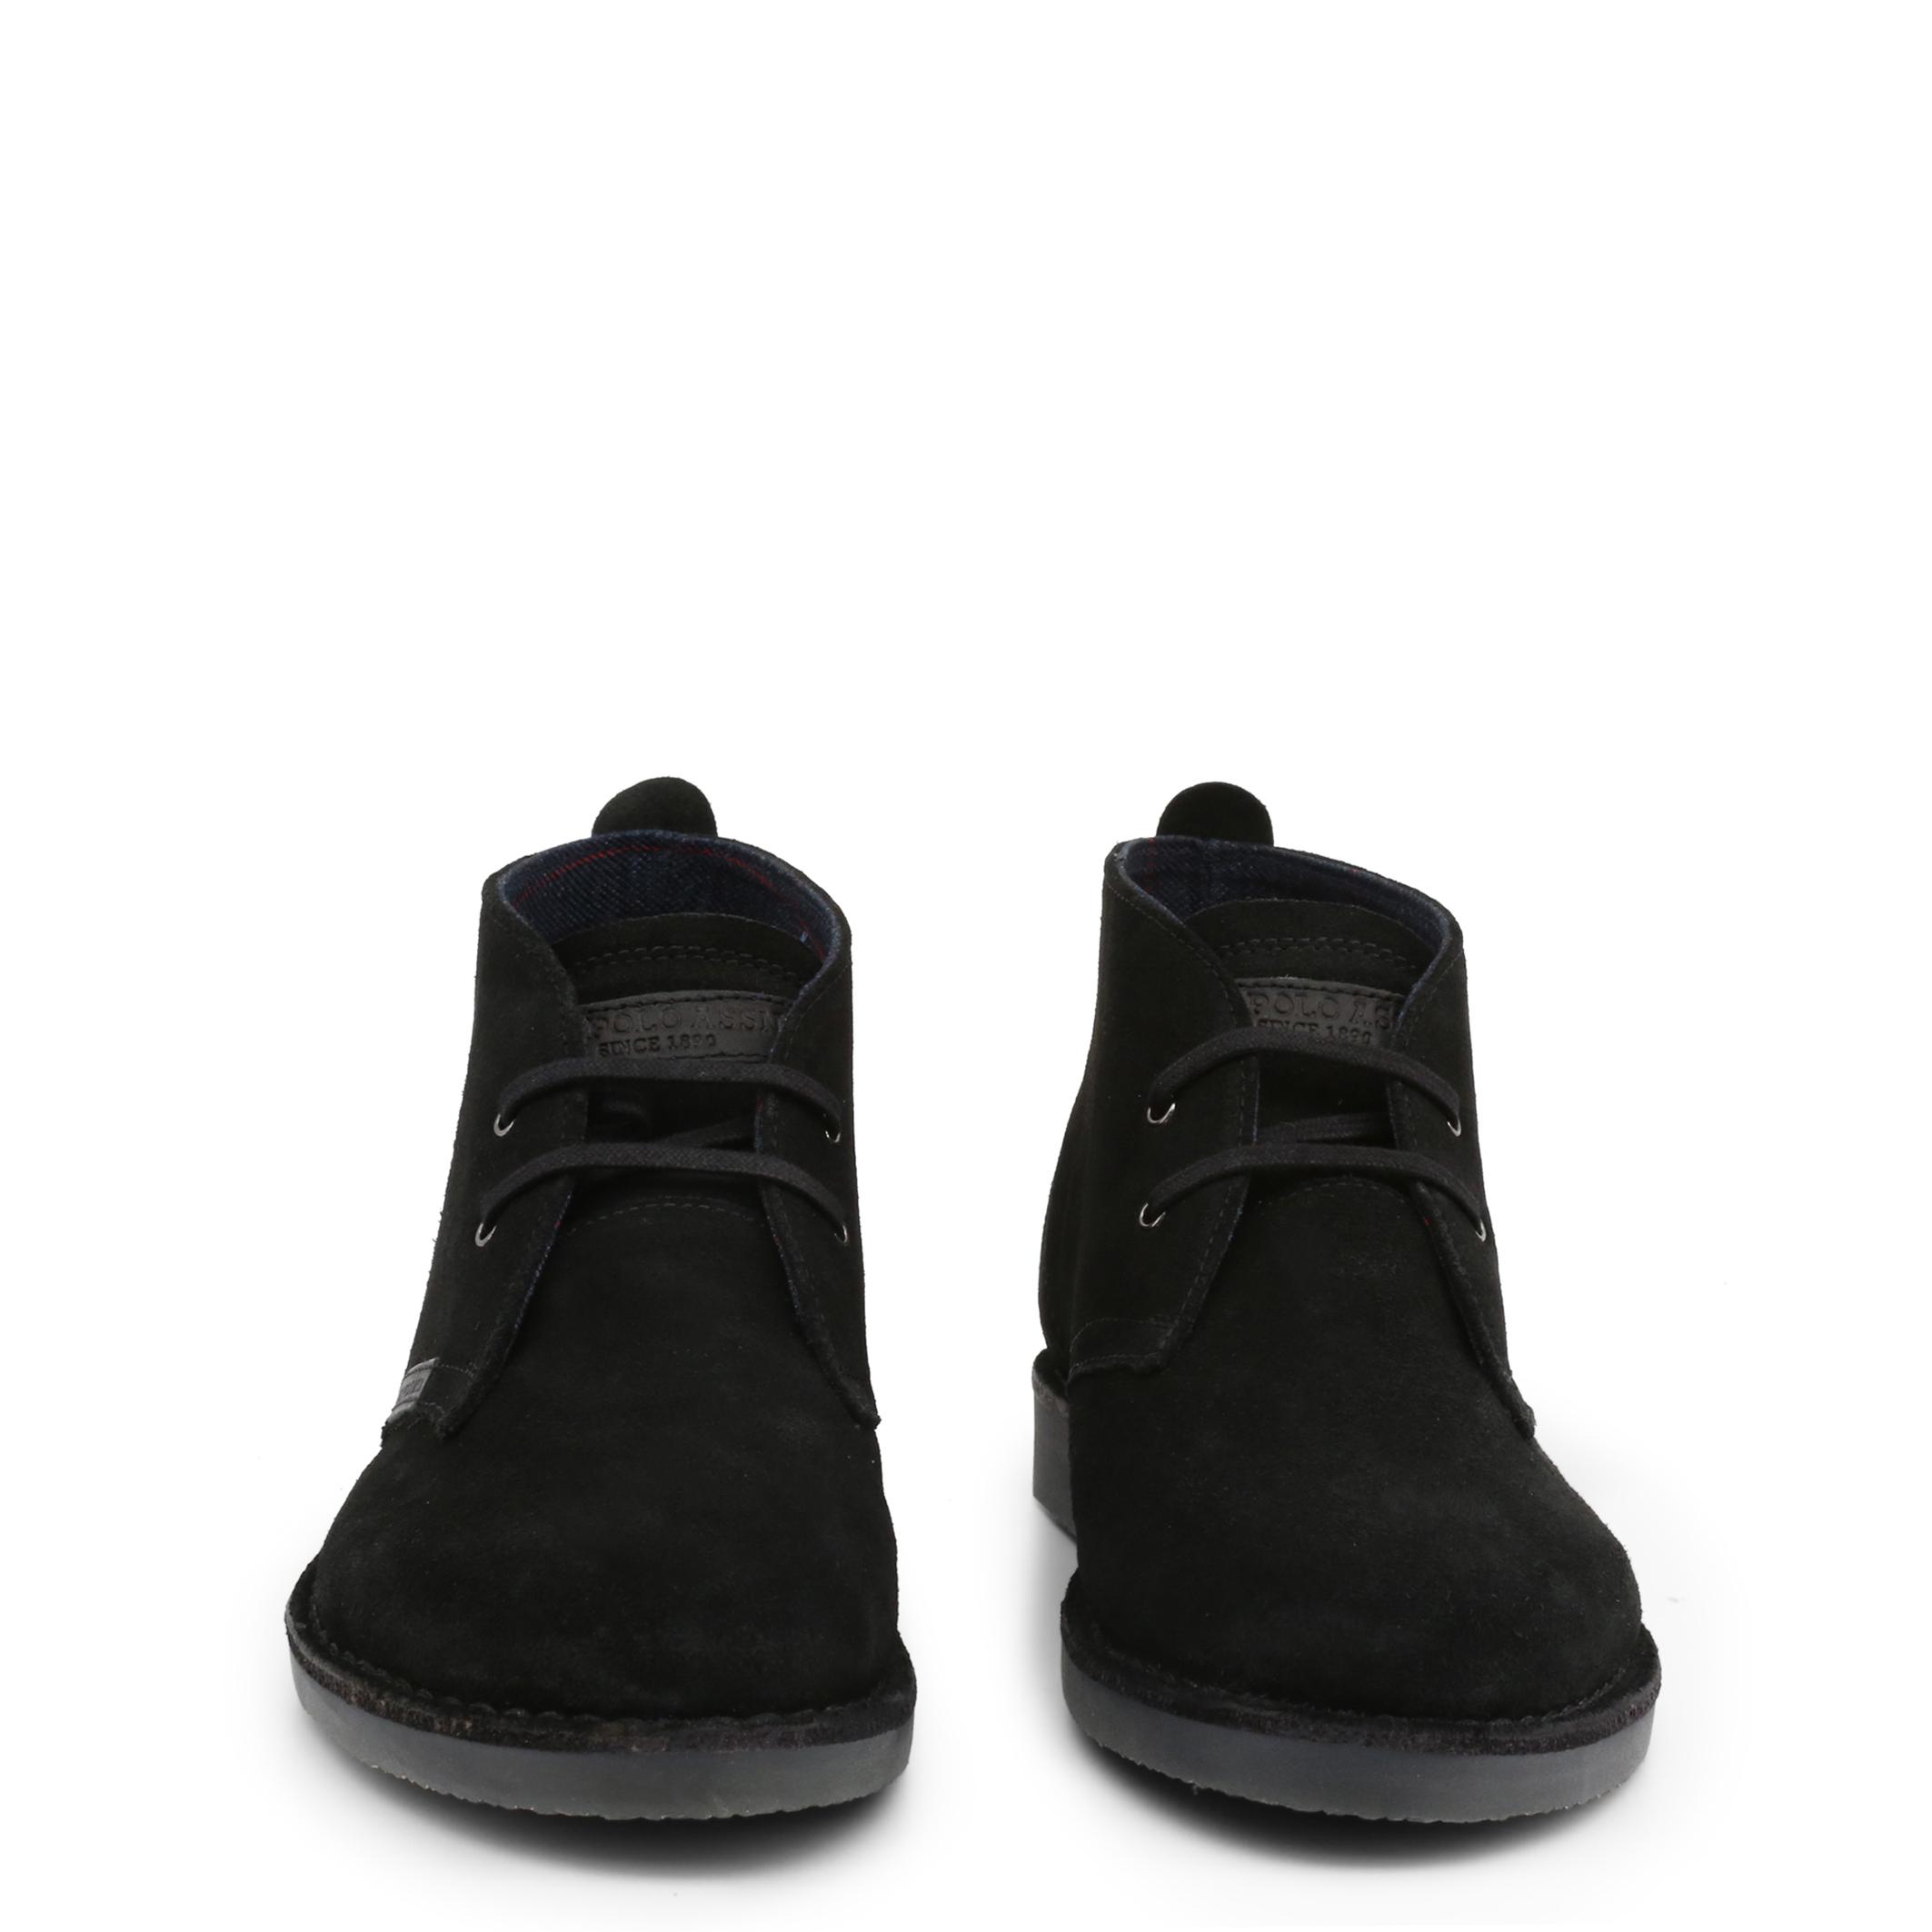 Chaussures de ville  U.S. Polo Assn. MUST3119S4_S19A_BLK black